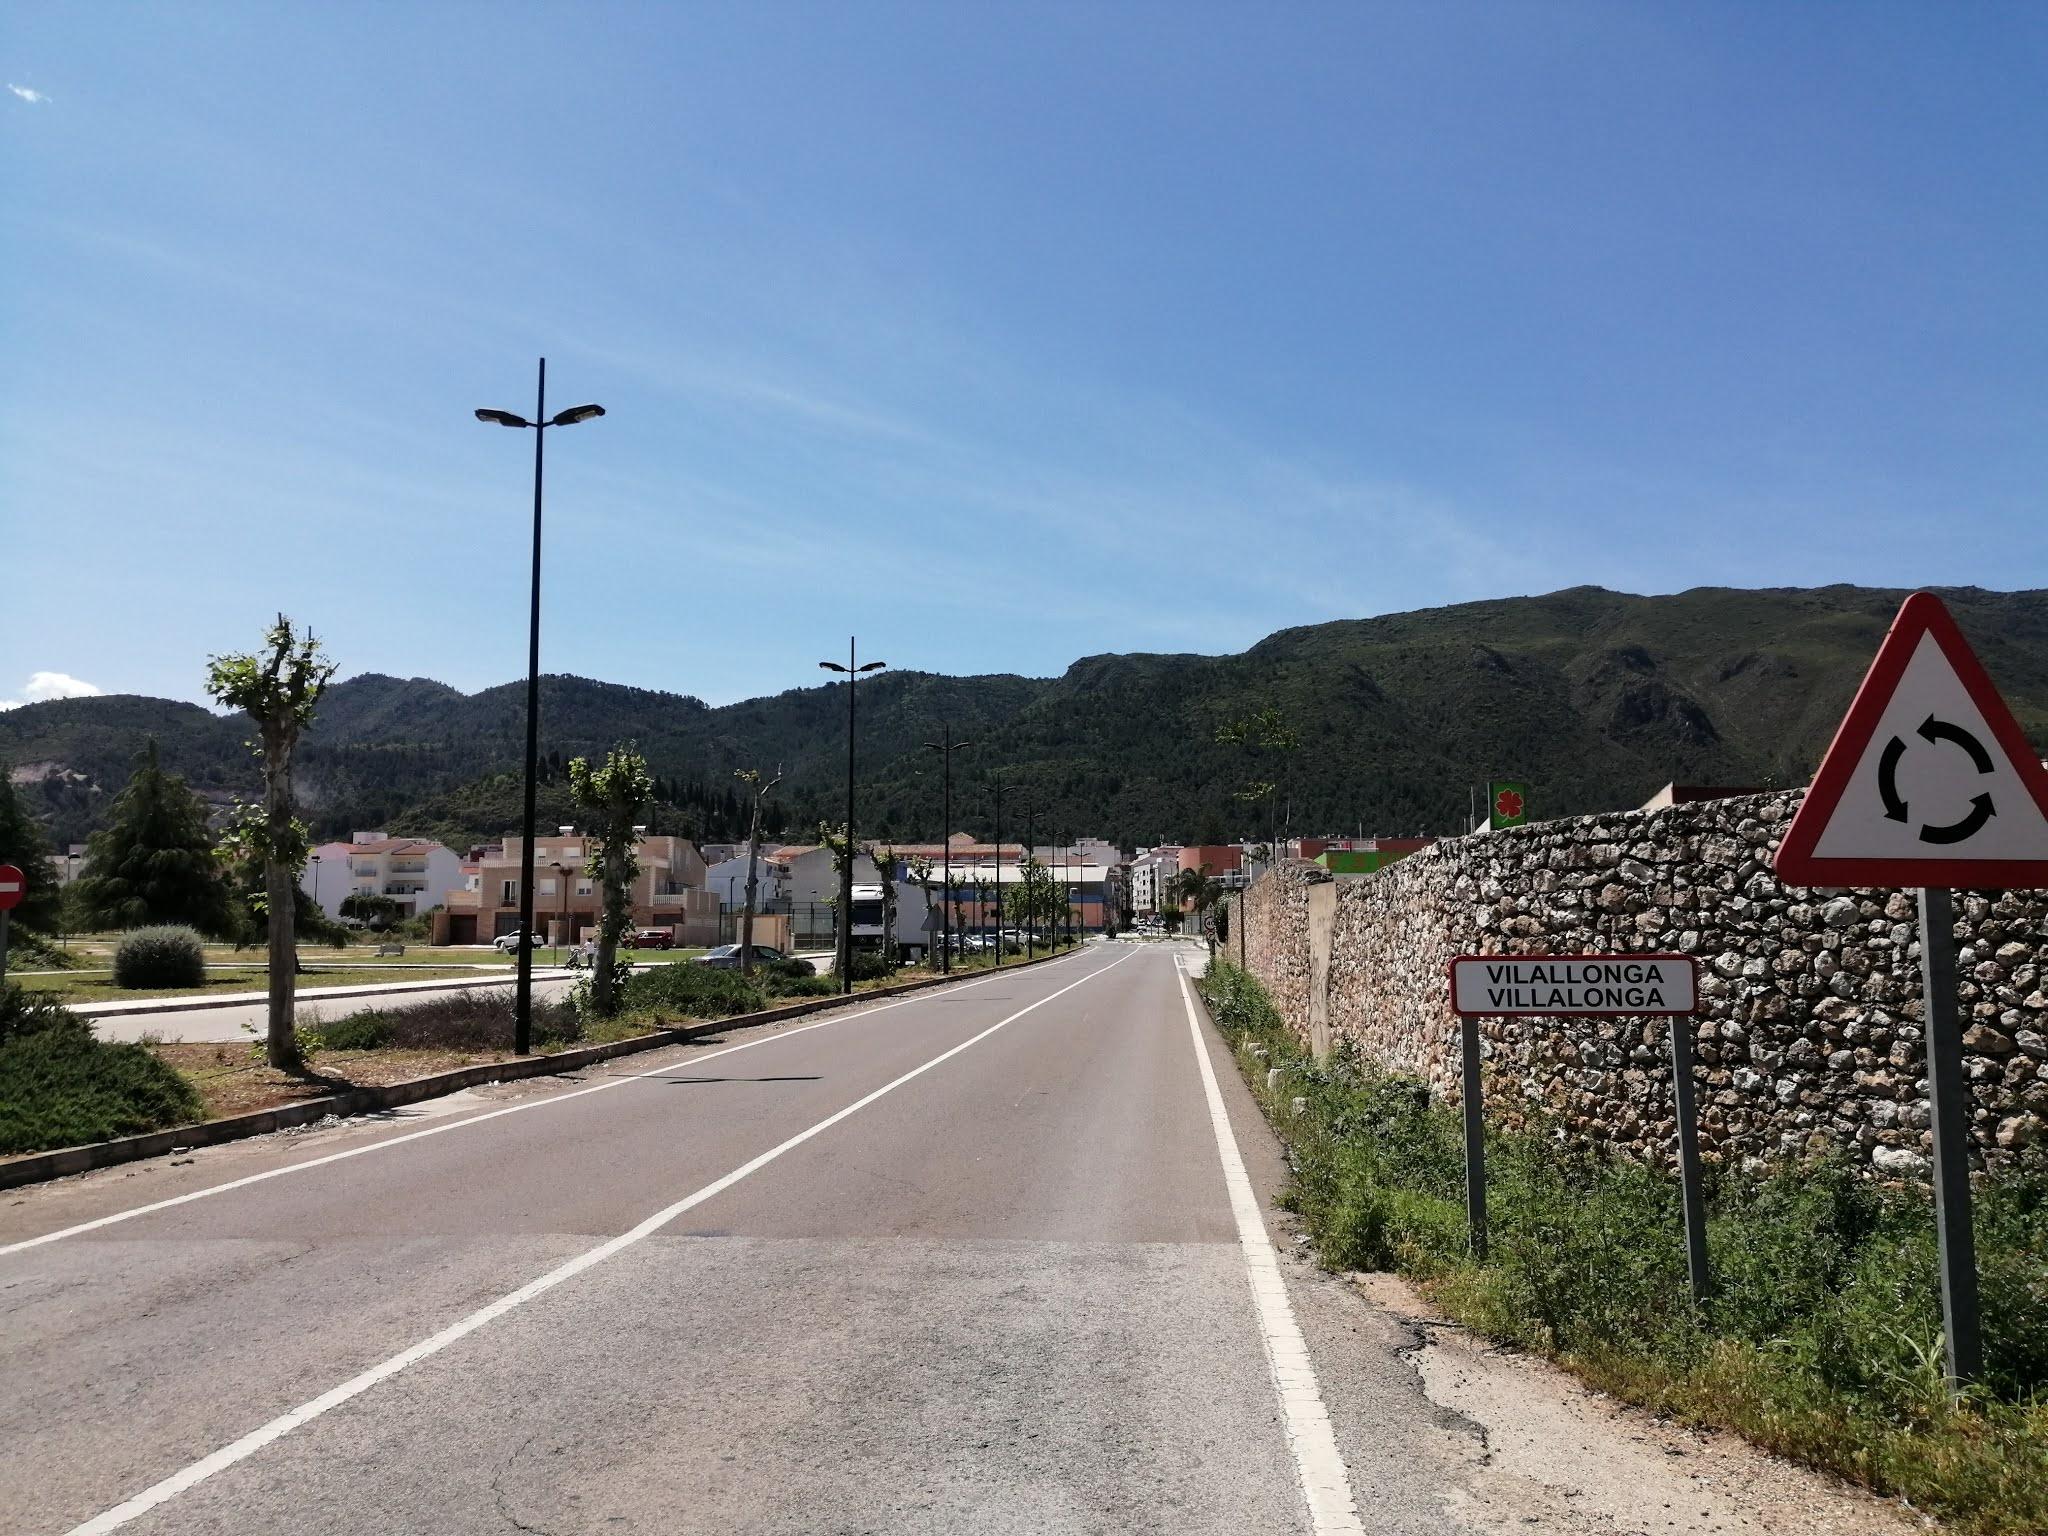 Entrance to Villalonga from the direction of Gandia, Valencia, Spain